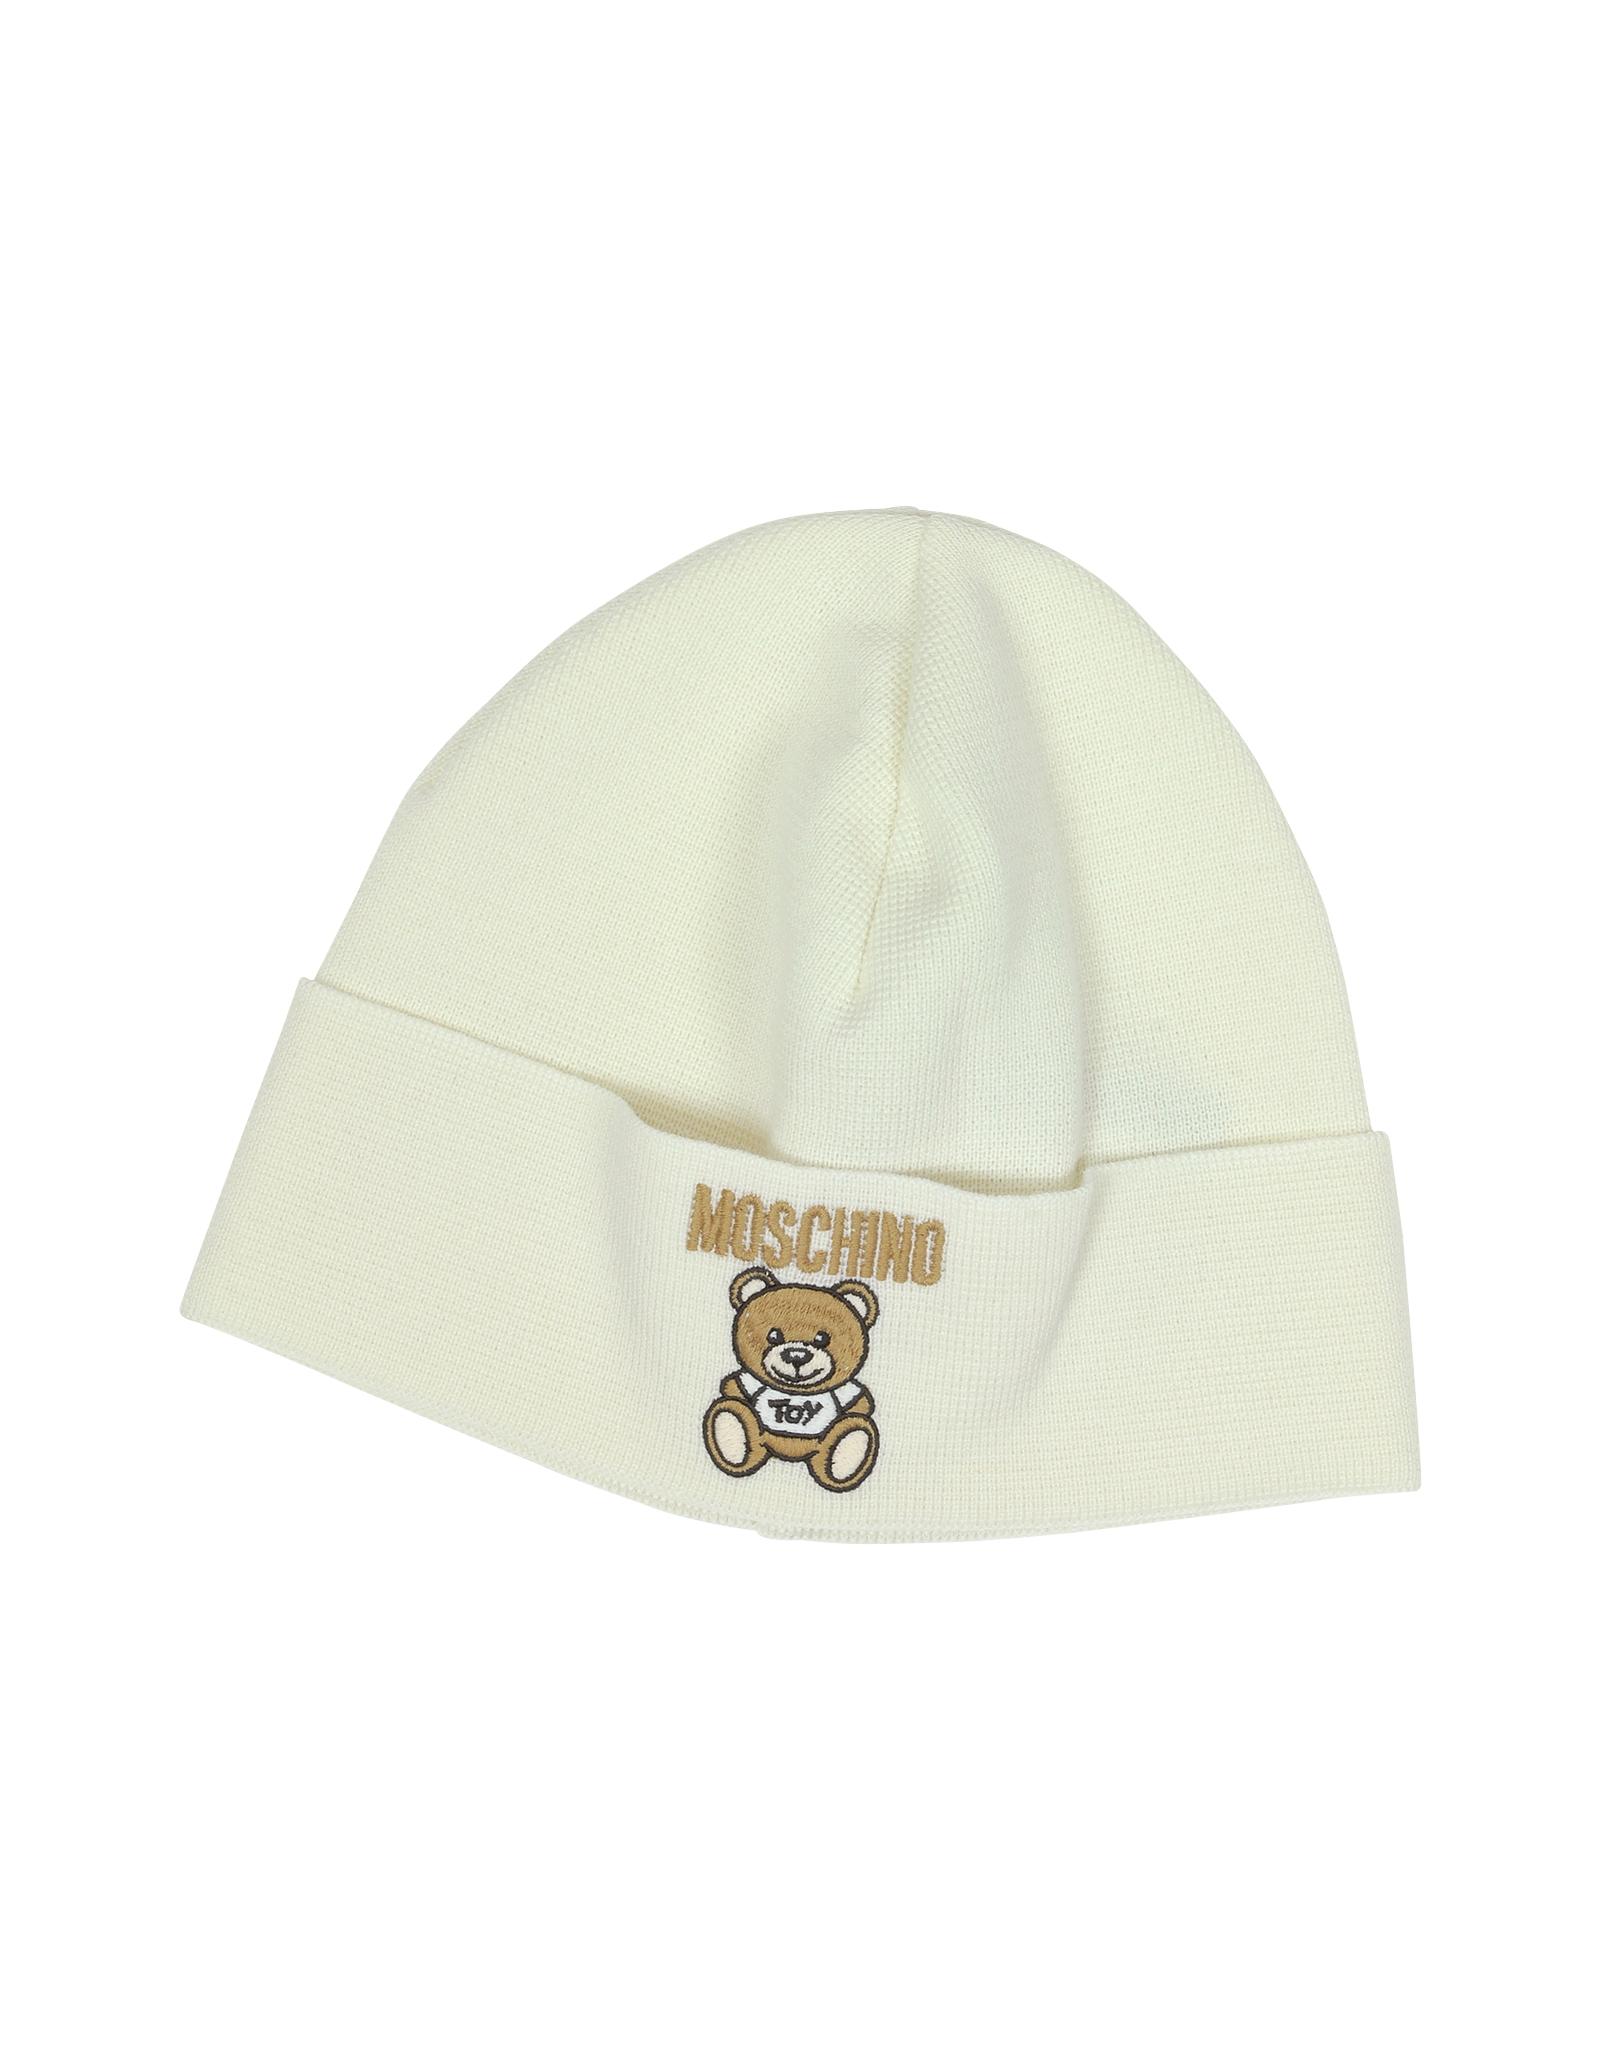 a949d1db362ff Moschino Teddy Bear Wool Blend Hat in White - Lyst